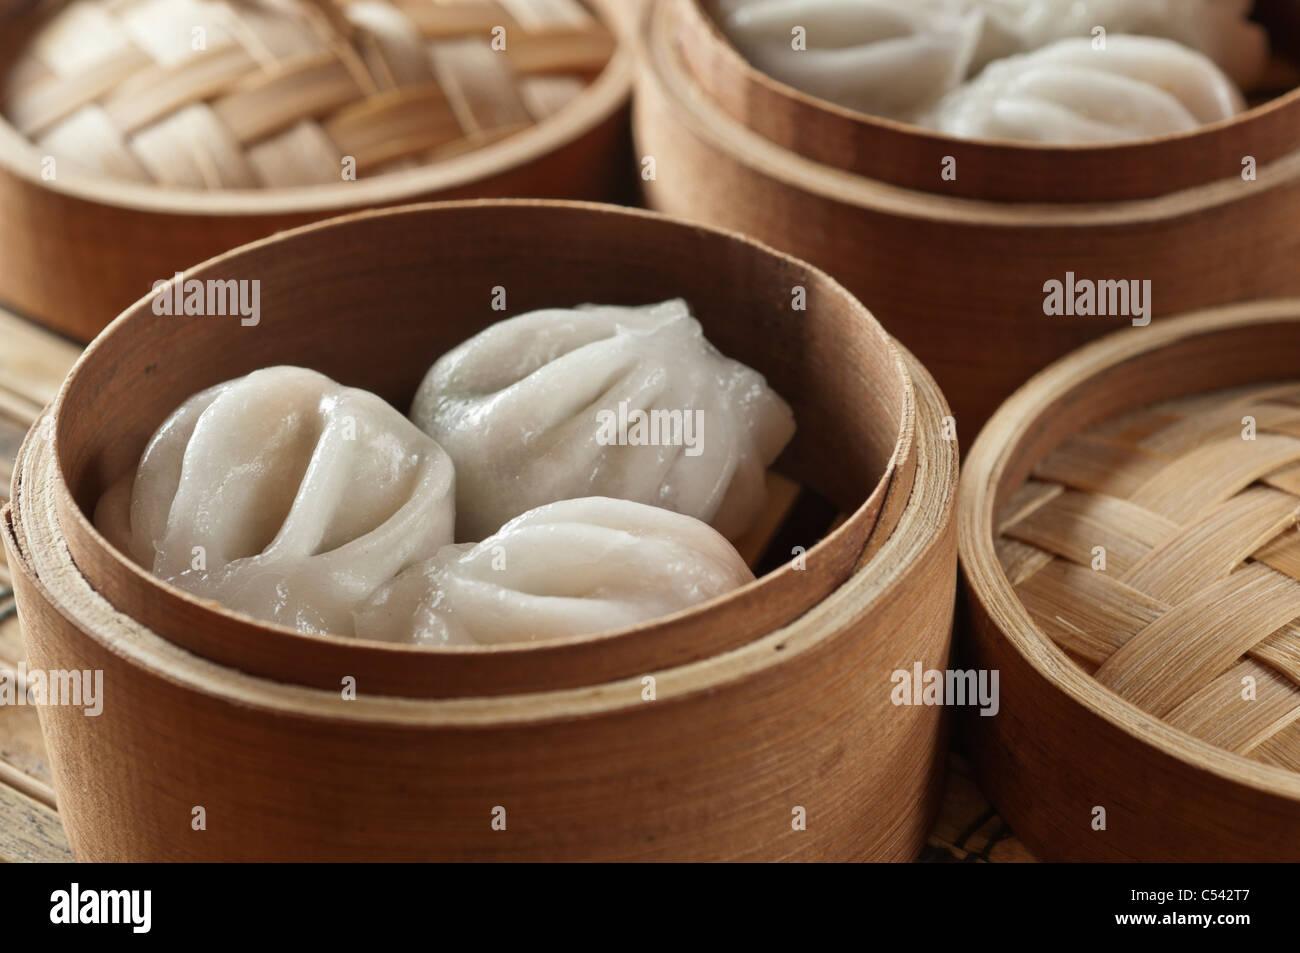 Dim sum. Steamed dumplings in steamer baskets - Stock Image